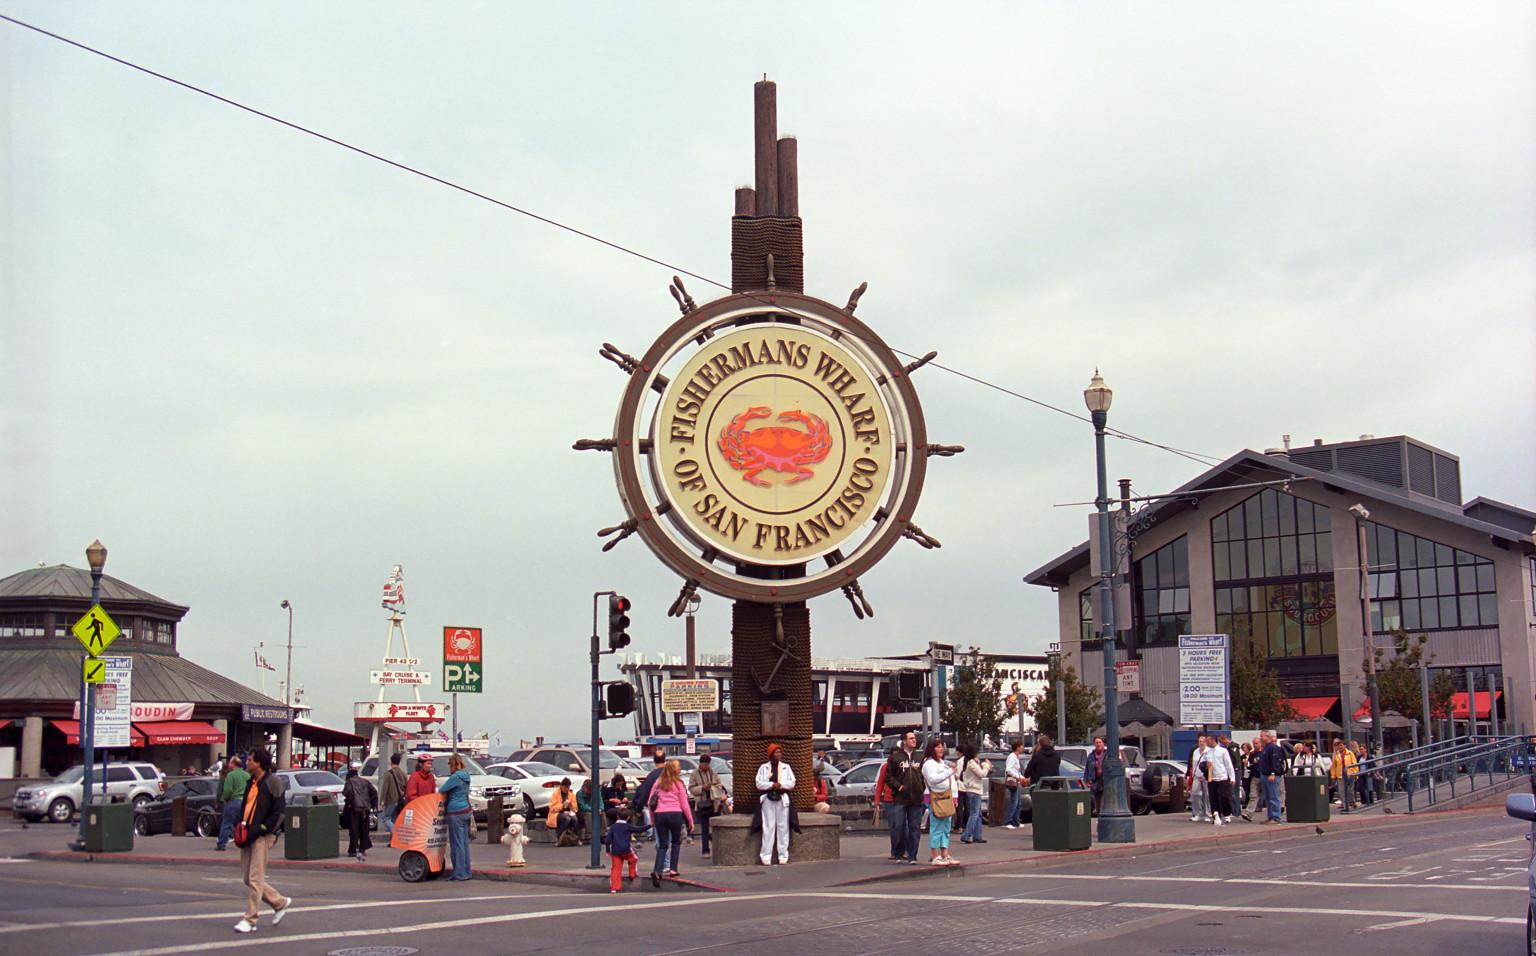 Seafood Fishermans Wharf San Francisco